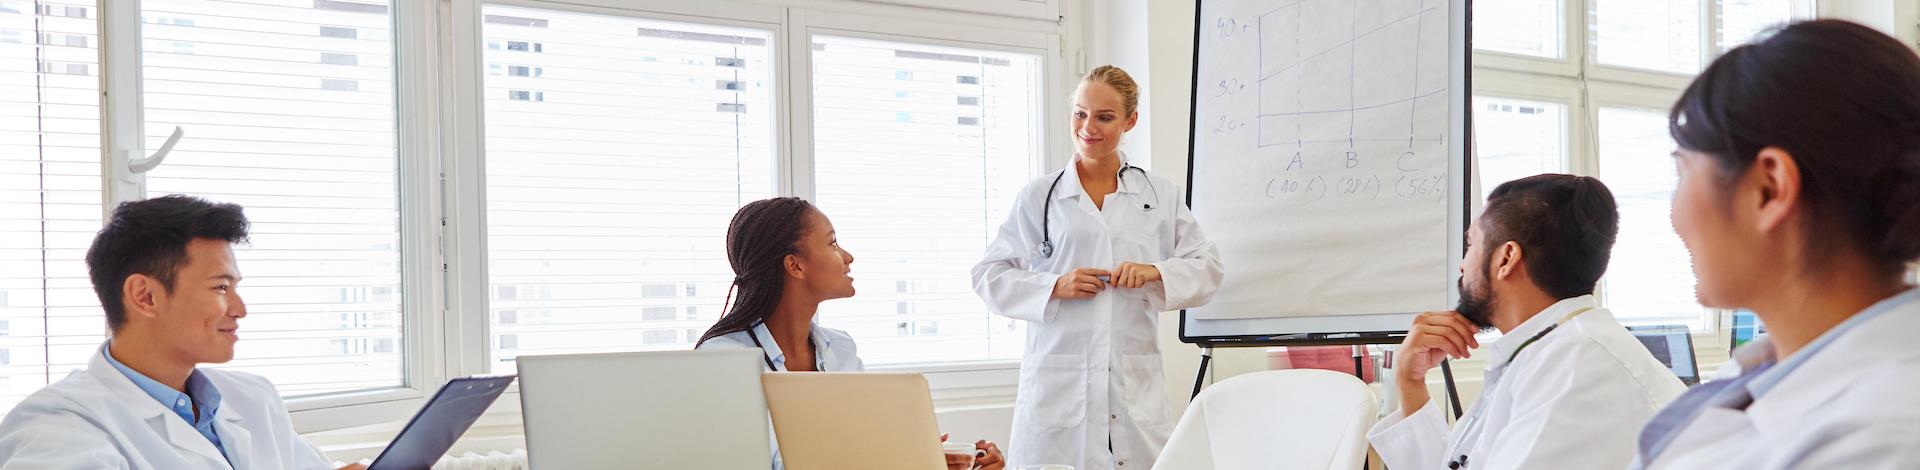 Certified Nurse Assistant Training Program Application